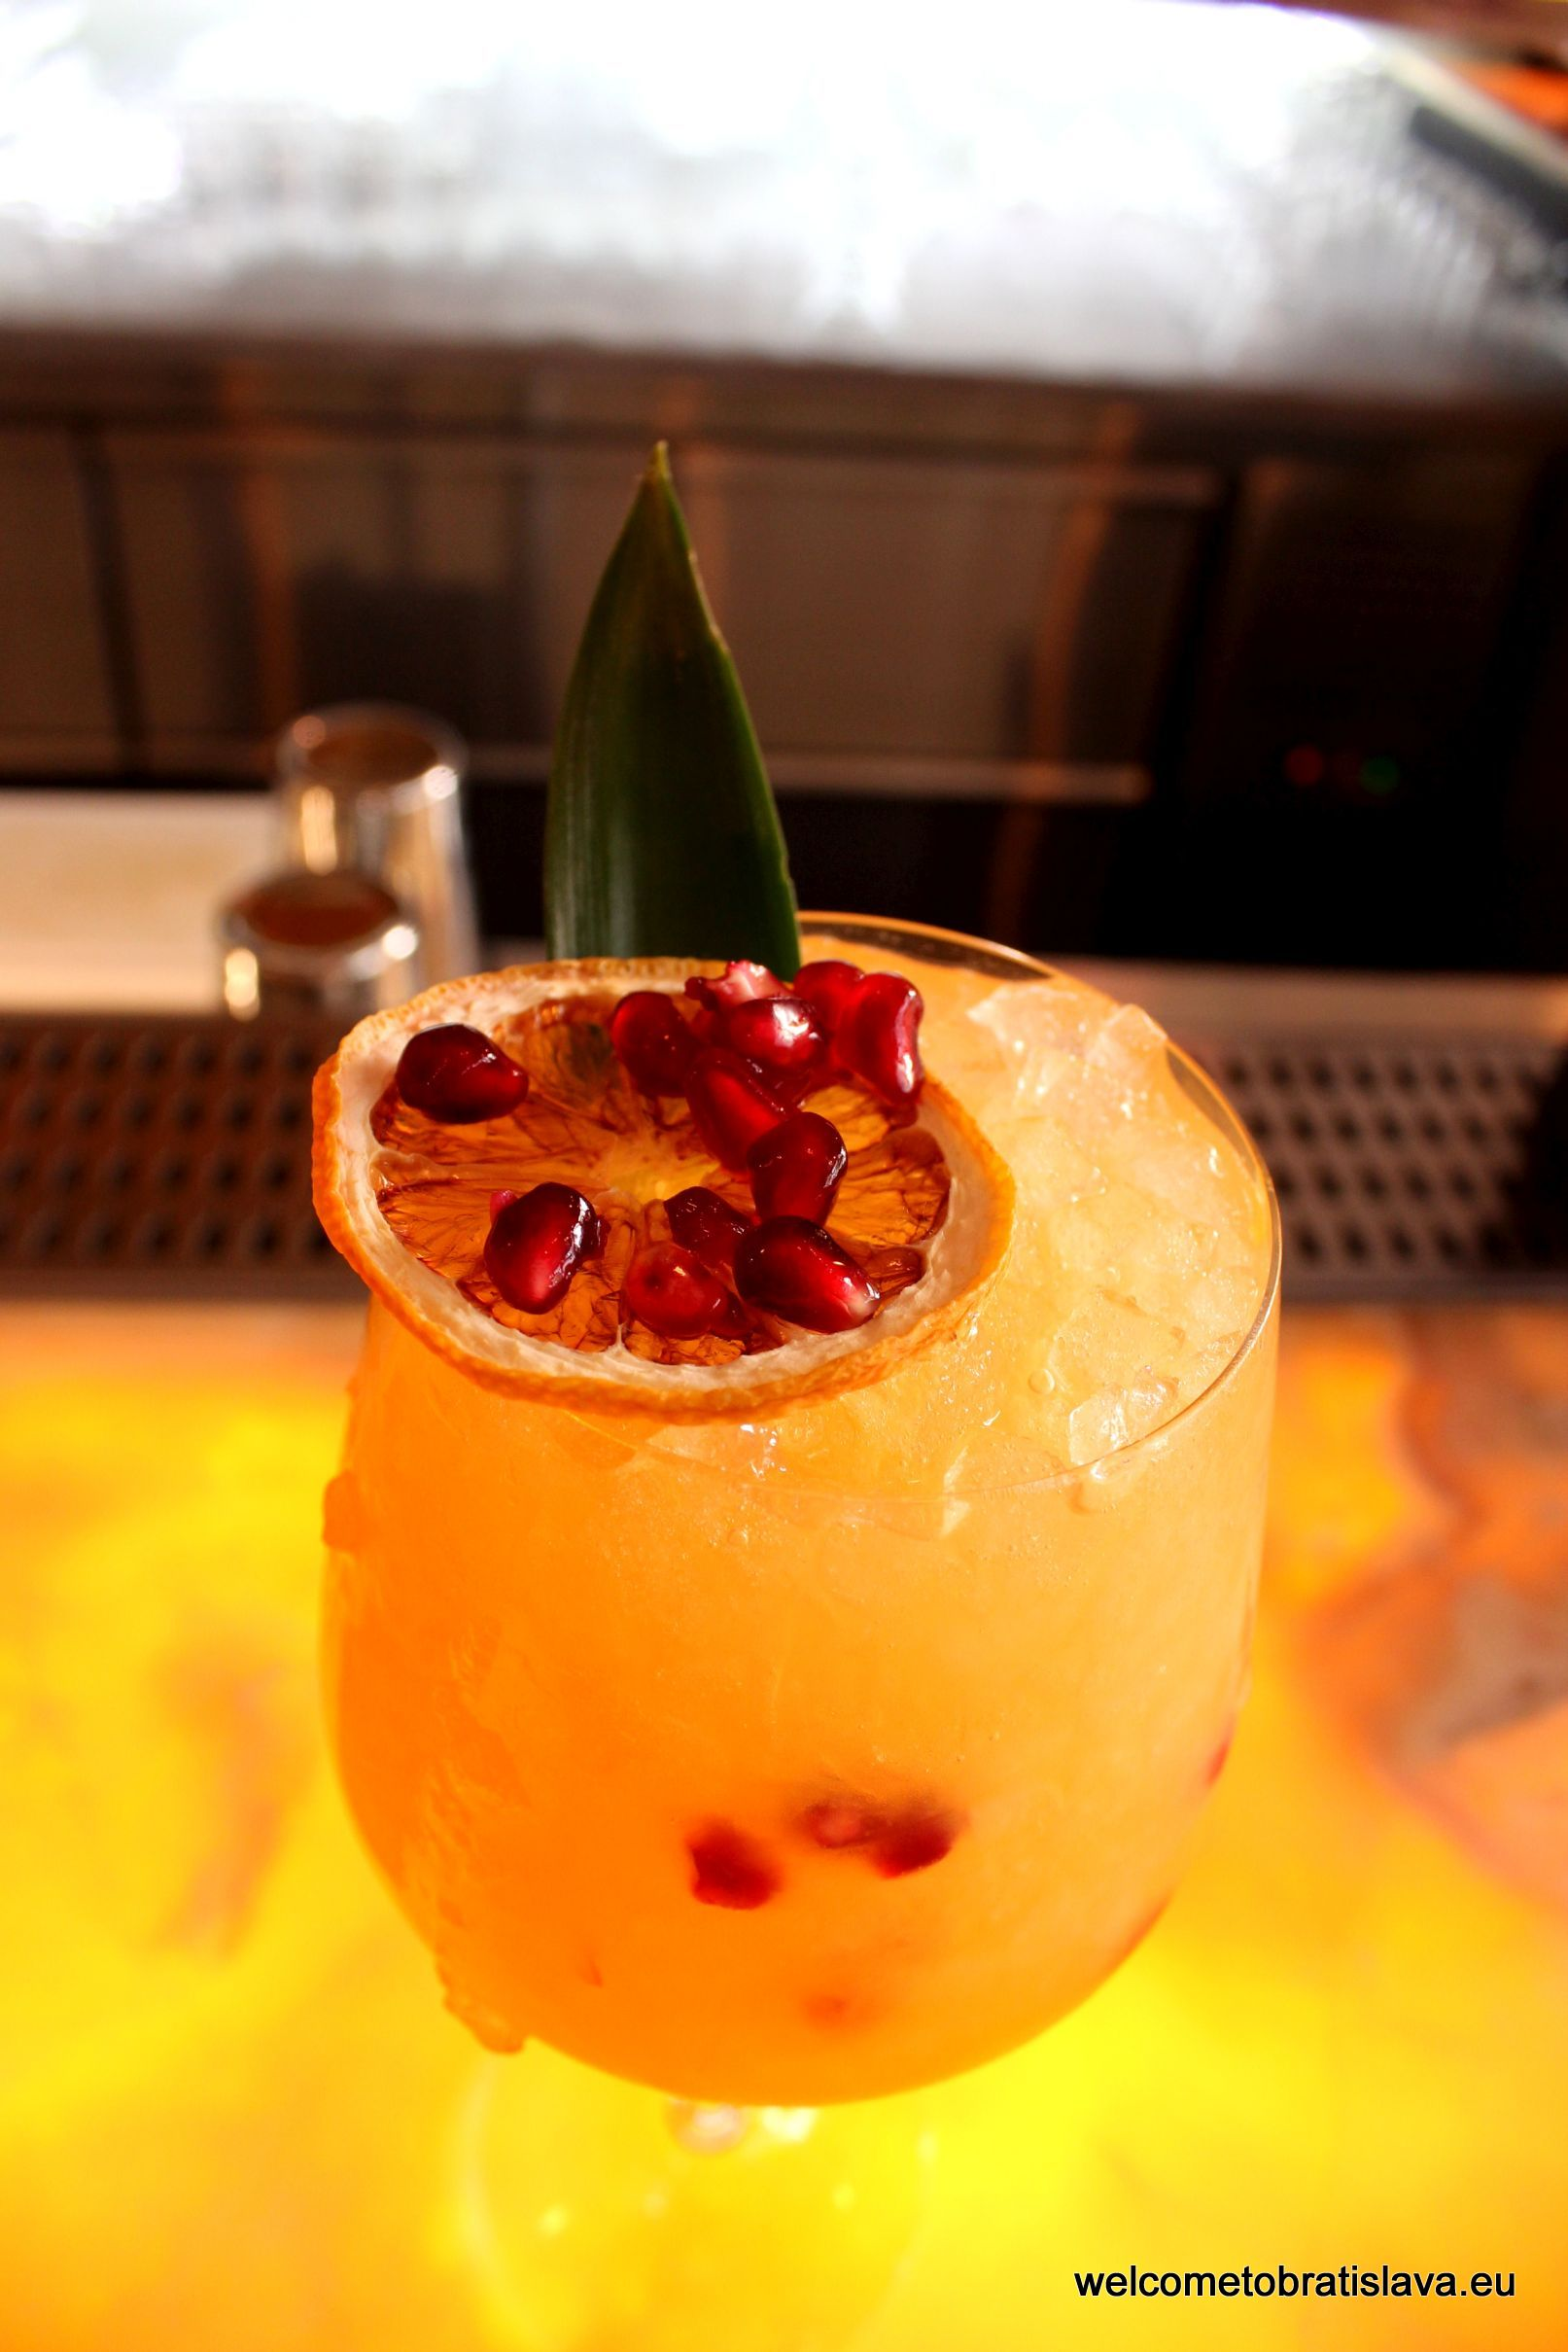 Best cocktail places Belleza de Verano in Cuba Libre